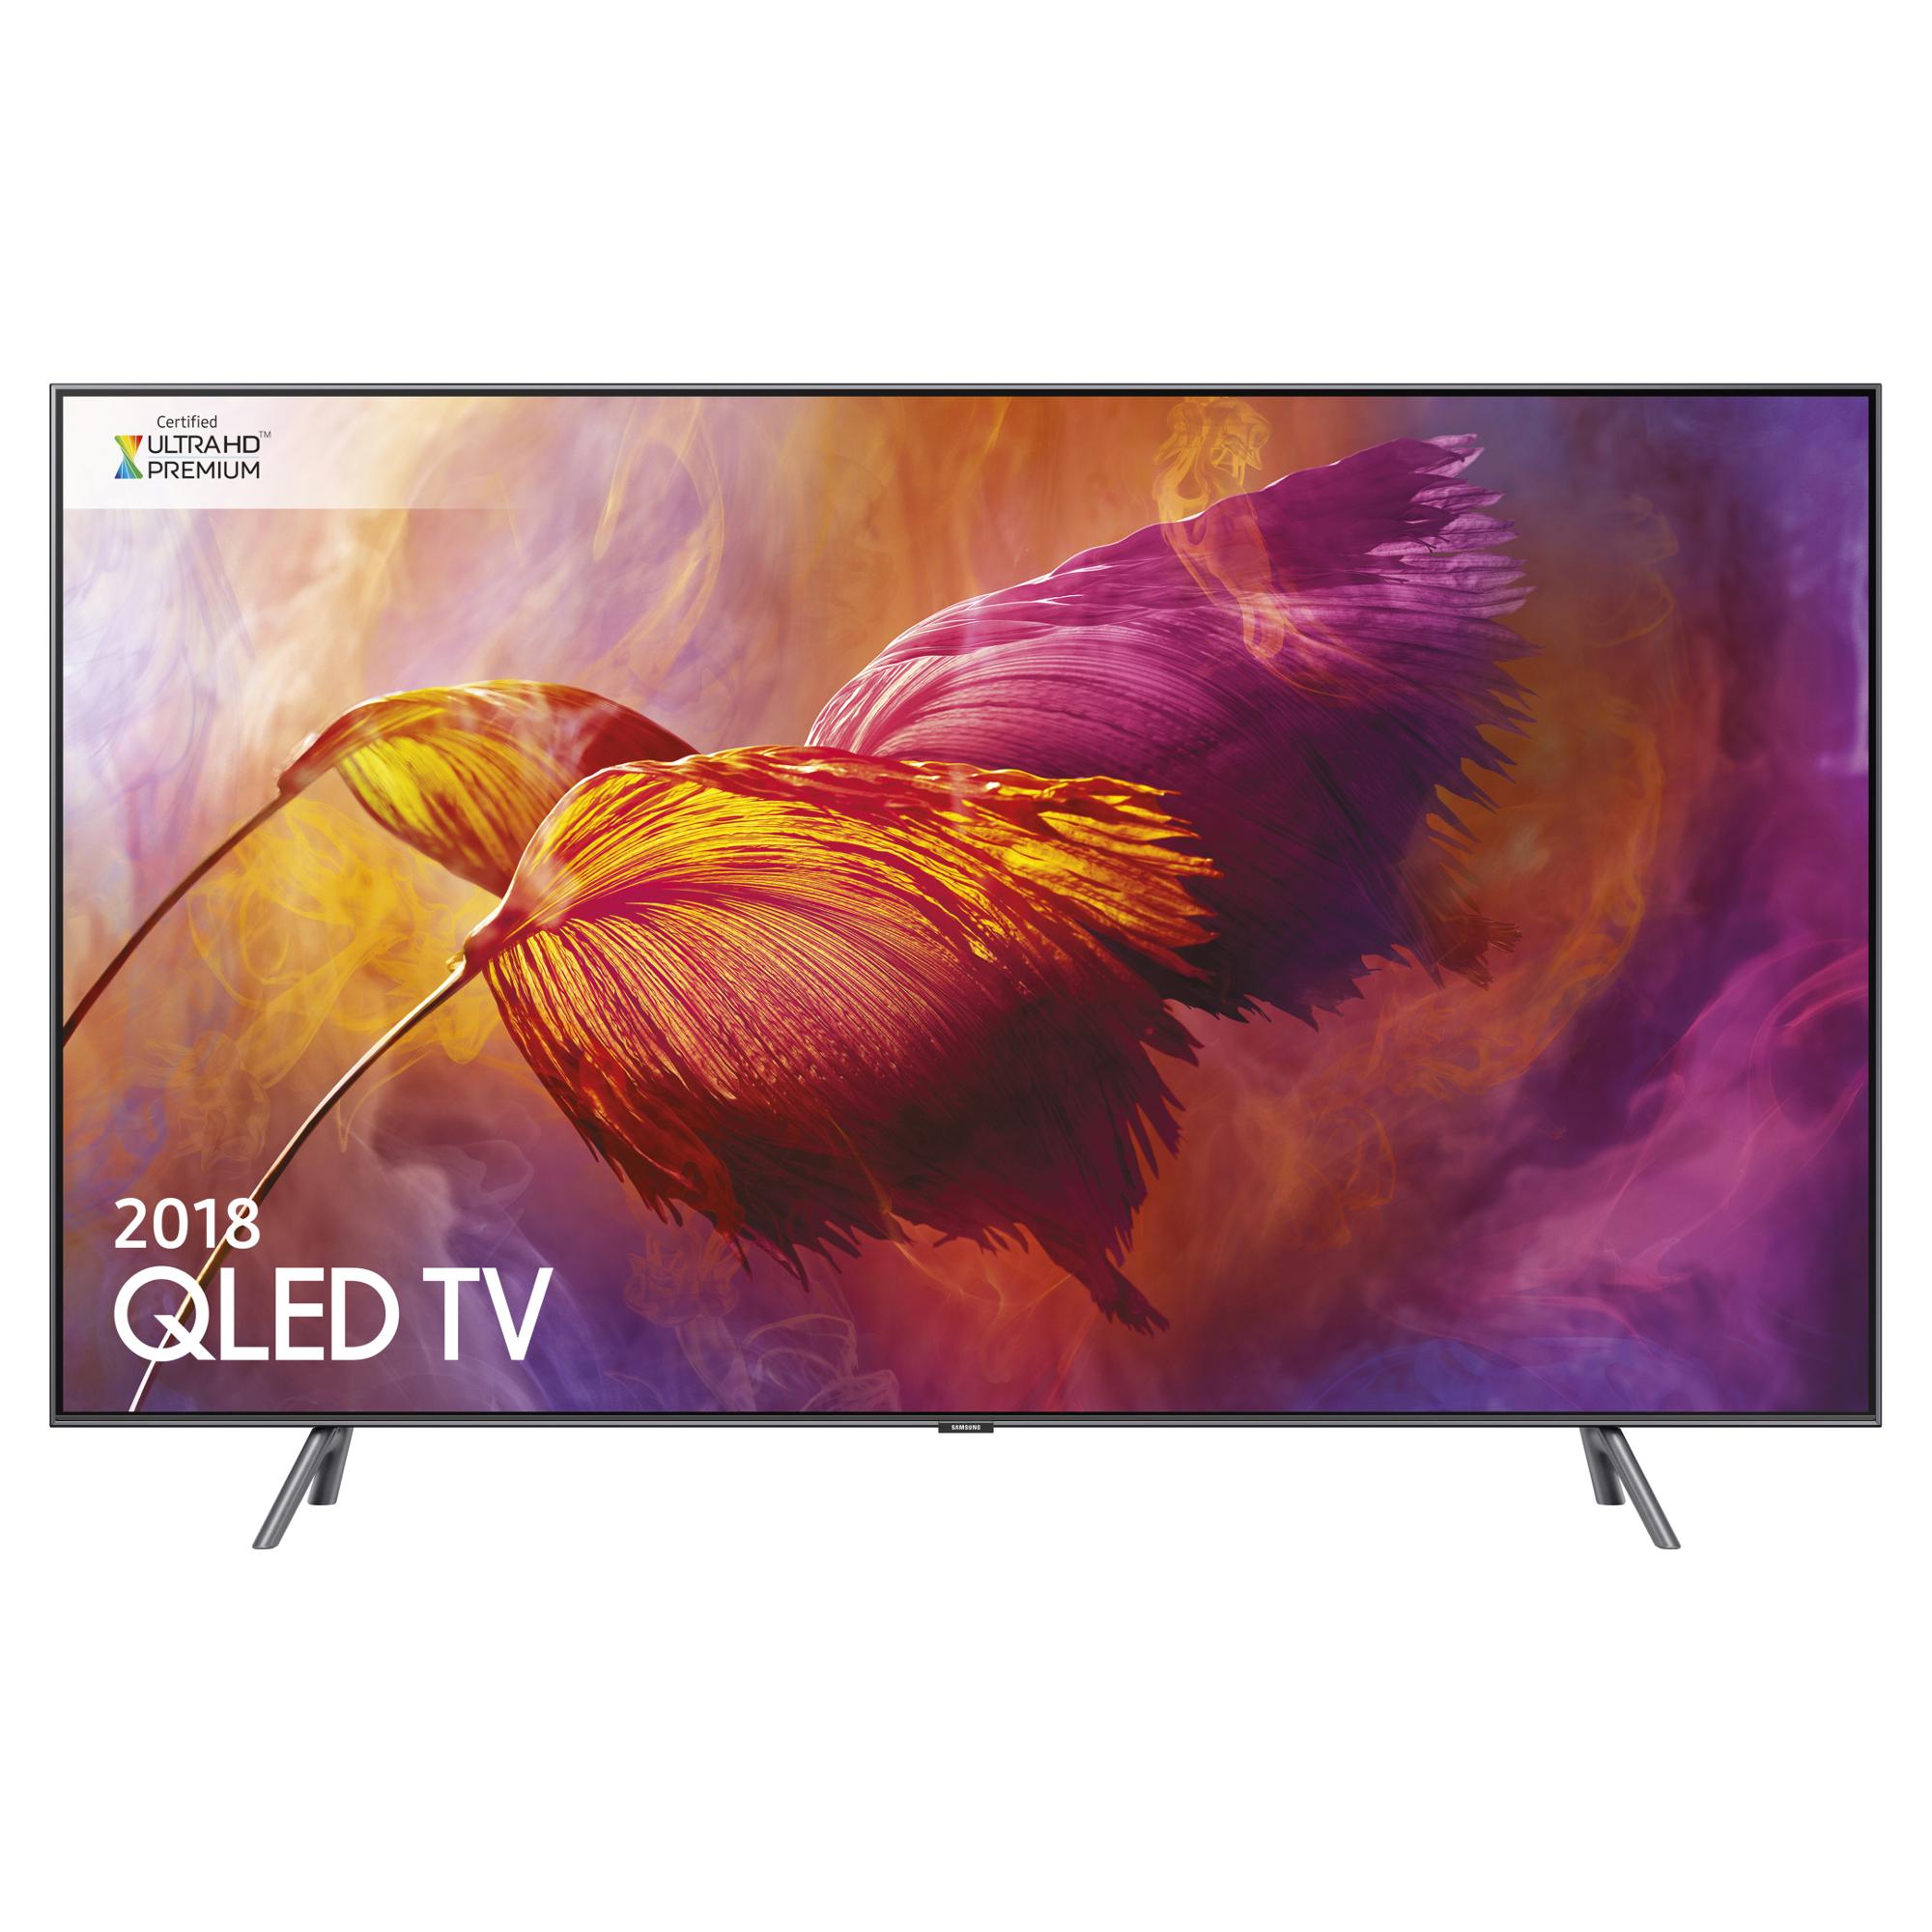 "Samsung QE55Q8DN (2018) QLED HDR 1500 4K Ultra HD Smart TV, 55"" with TVPlus/Freesat HD & 360 Design, Ultra HD Premium Certified,"